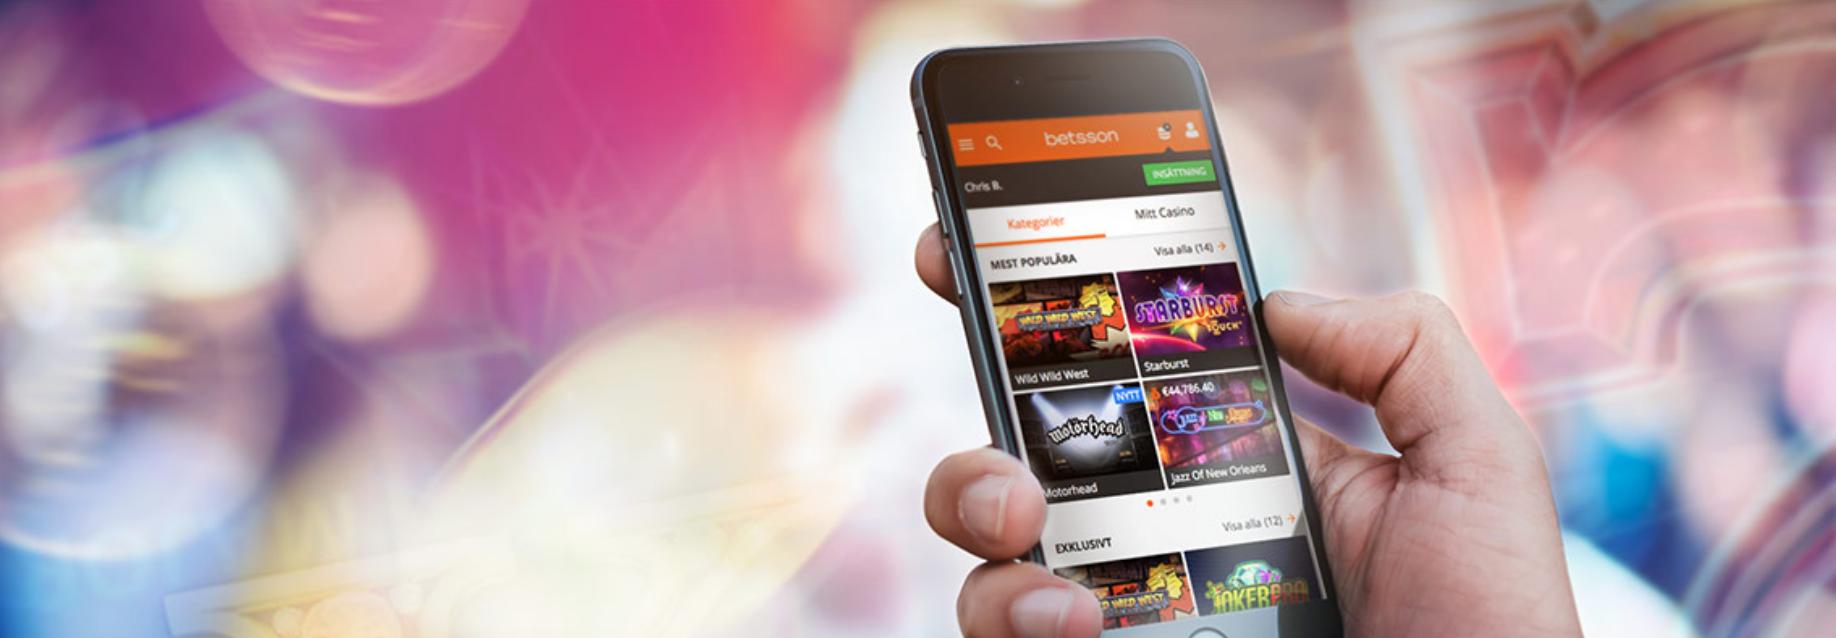 jouer casino sur smartphone